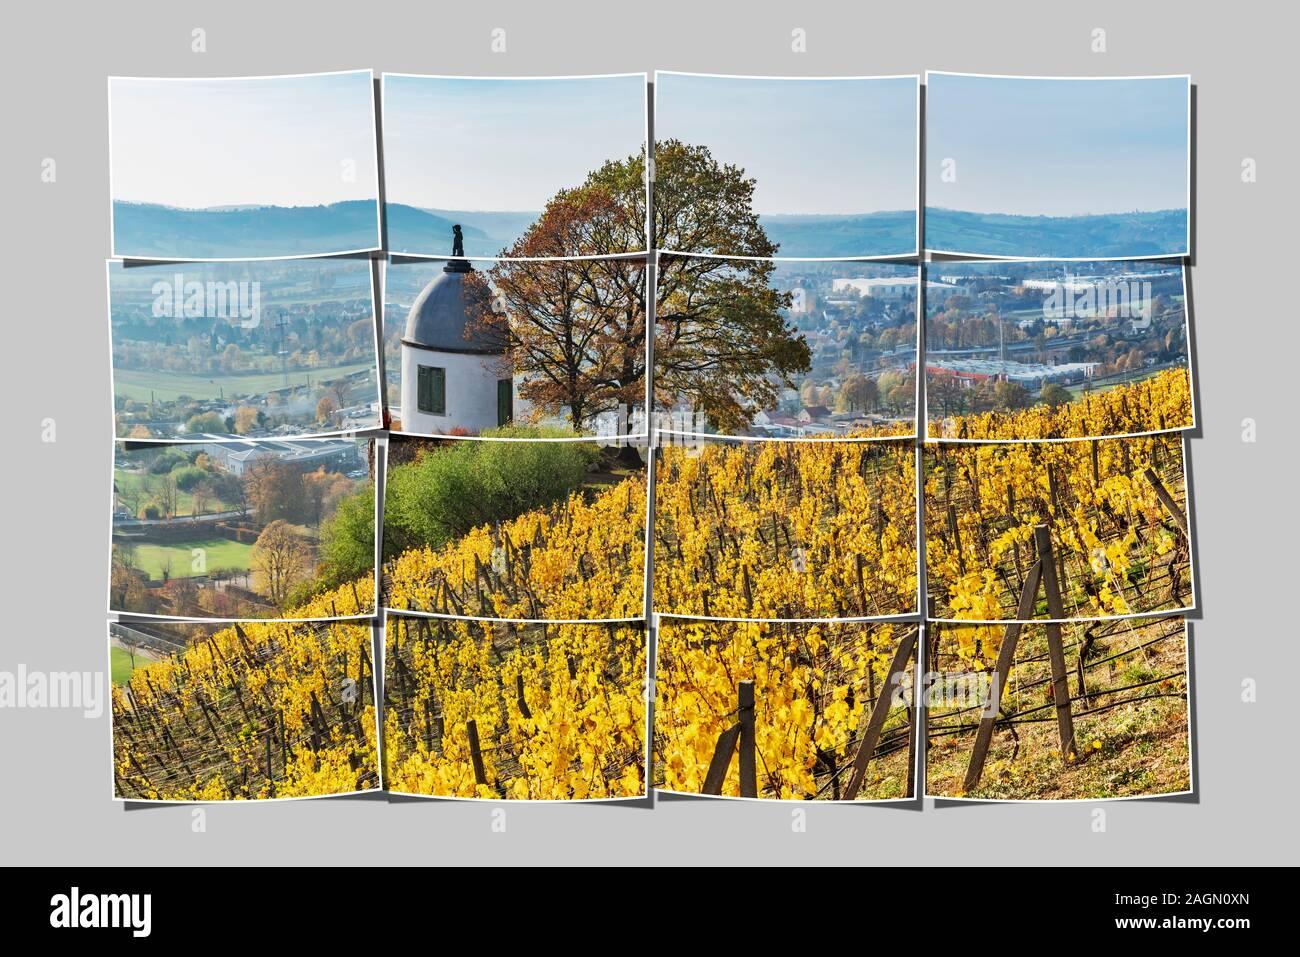 The Jacobstein is a vineyard gazebo in Radebeul near Dresden, administrative district Meissen, Saxony, Germany, Europe Stock Photo